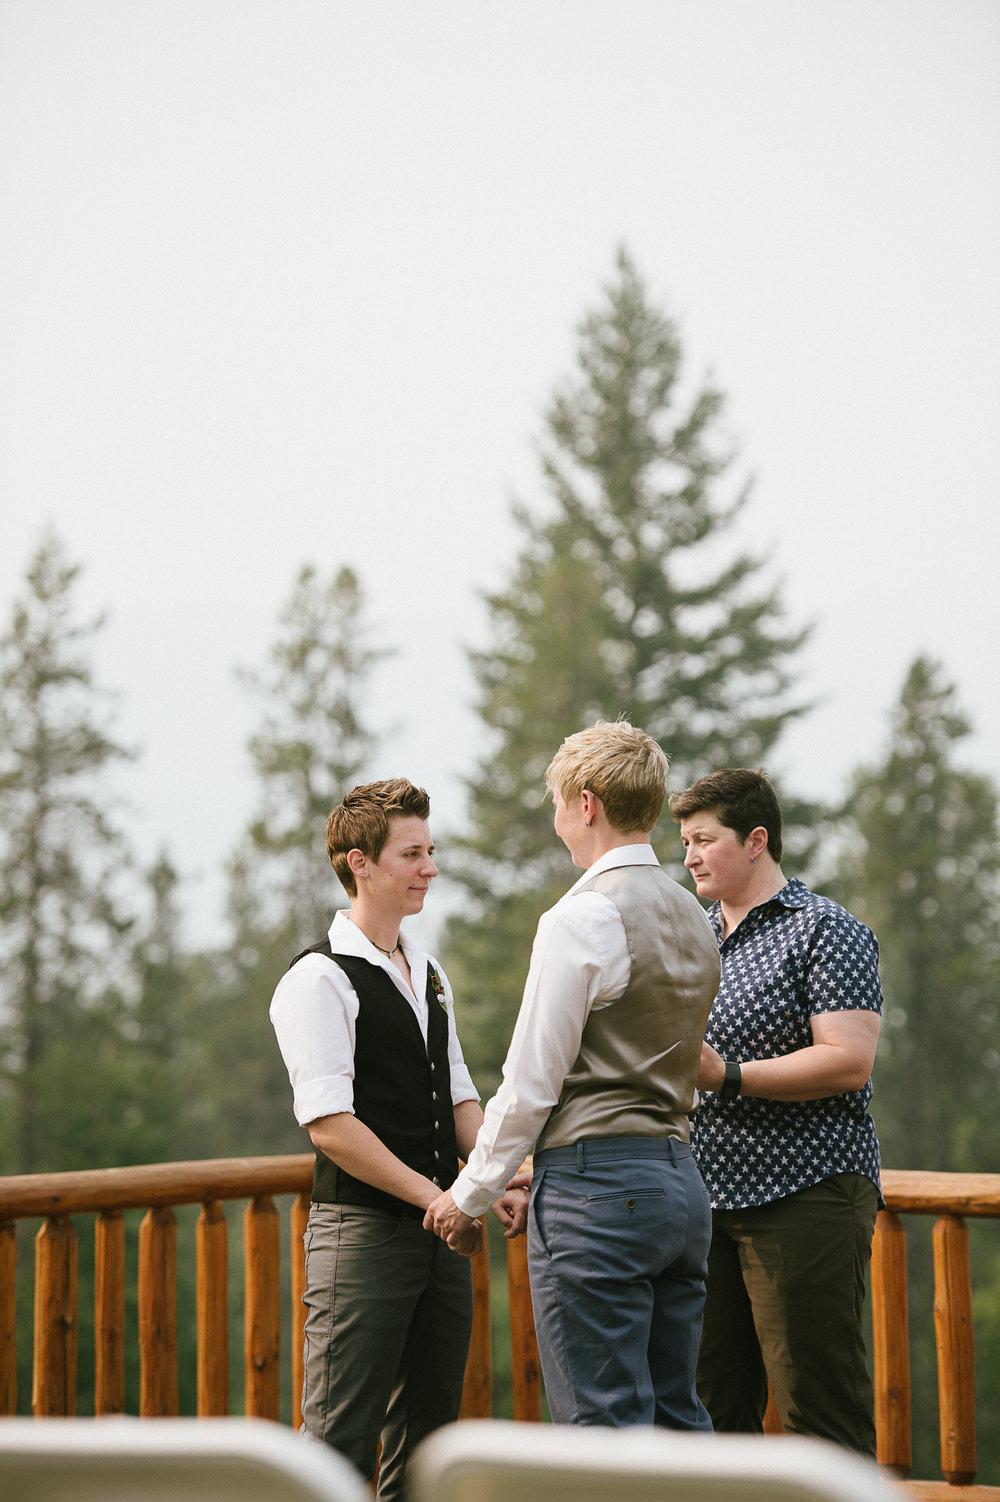 Glacier Montana Wedding_Elly Maurer + Frankie Dashiell Wedding_Beautiful Outdoor Wedding_Kelsey Lane Photography-4922.jpg